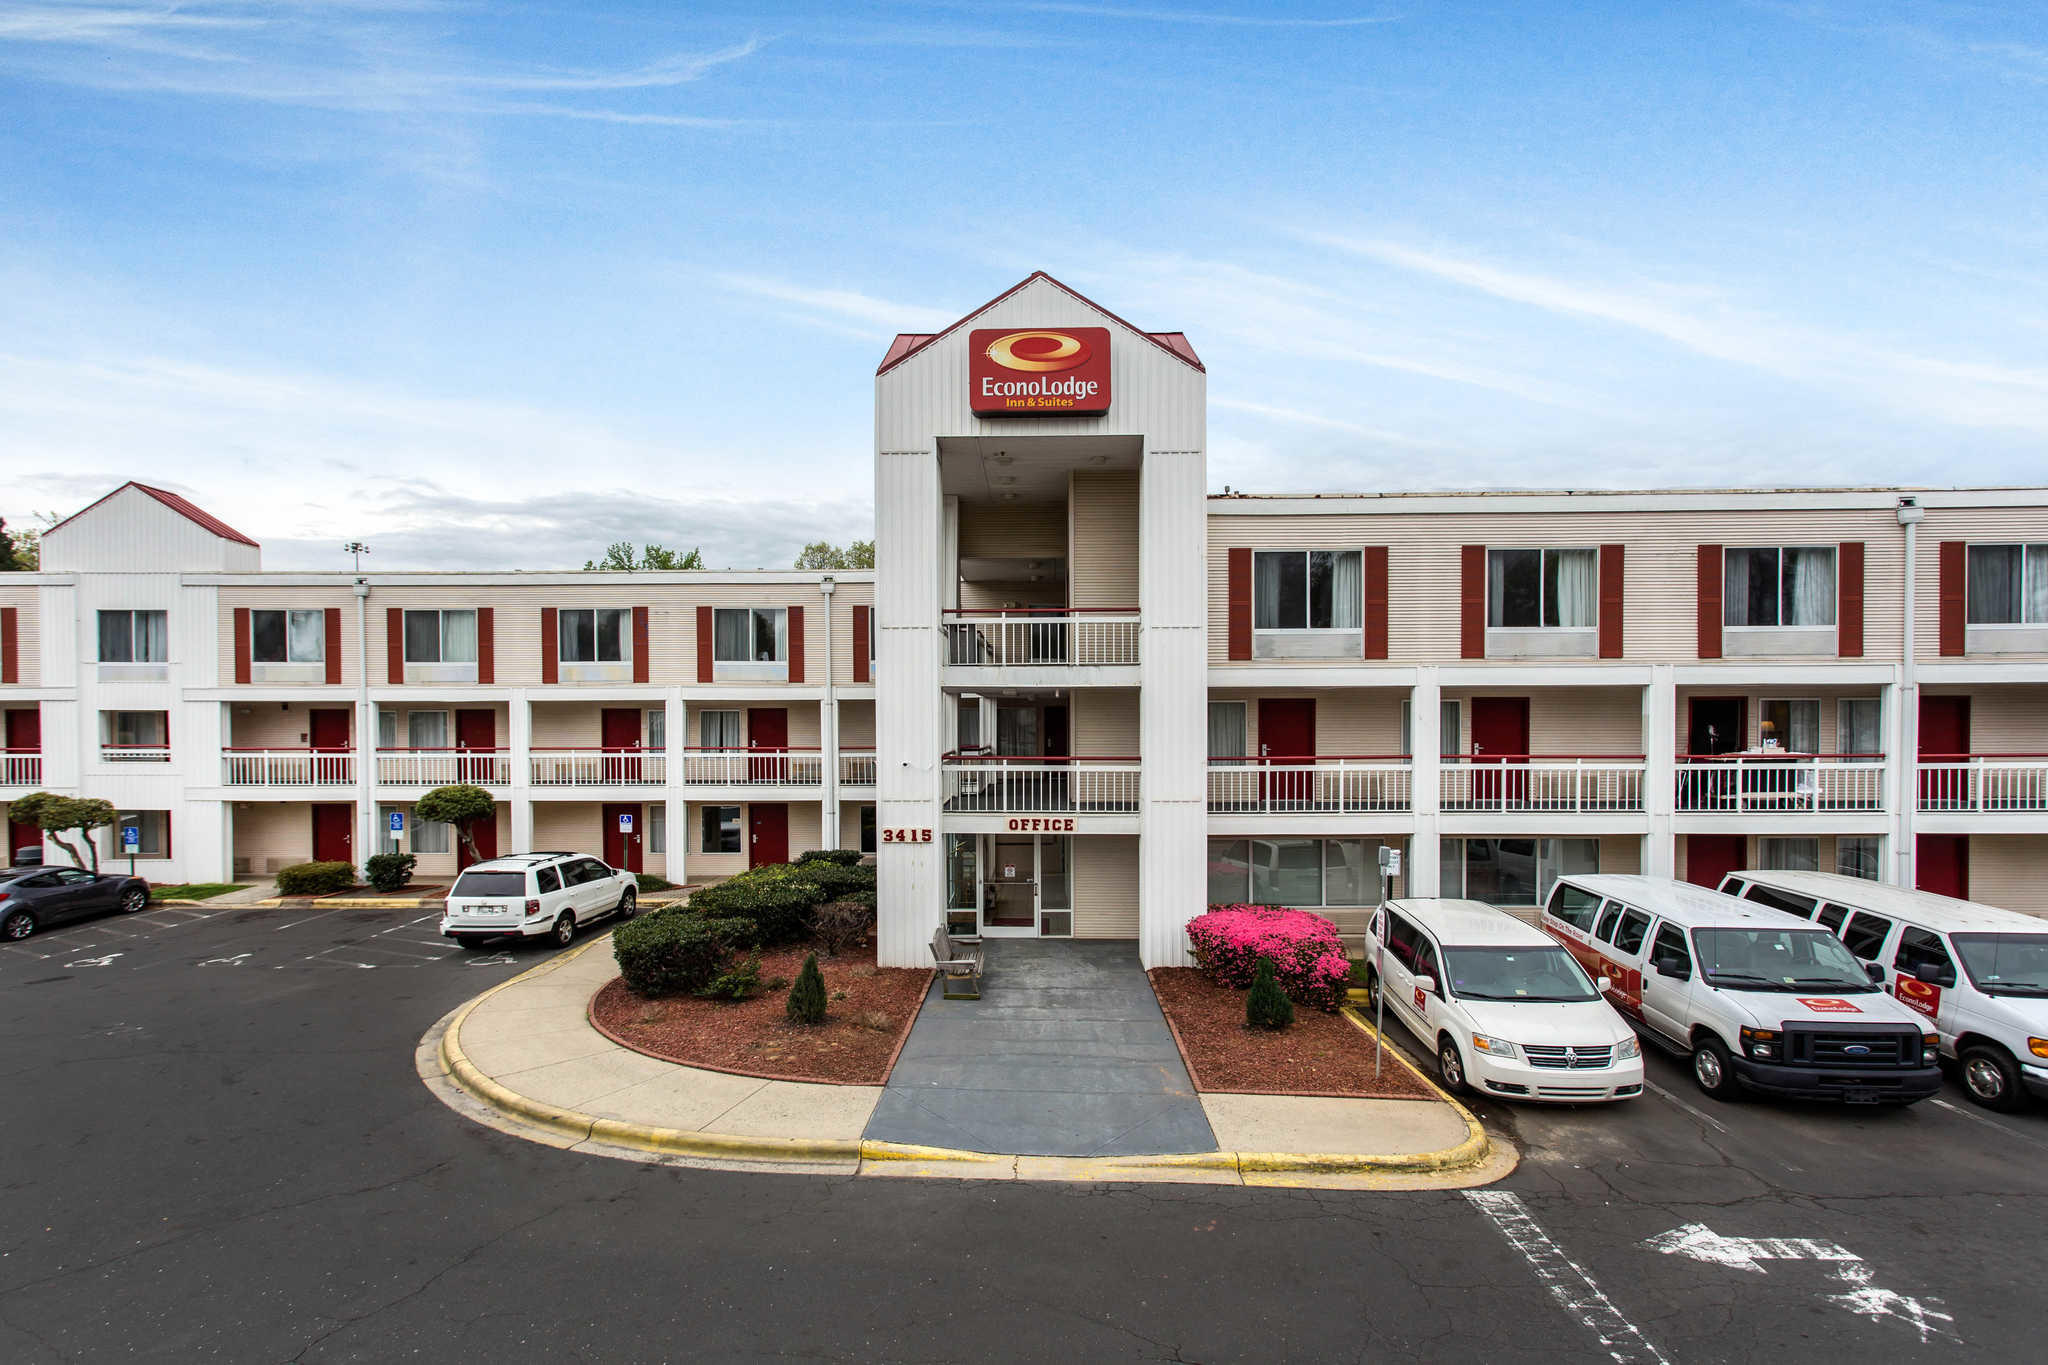 Nov 09, · Book Motel 6 Washington DC/Convention Center, Washington DC on TripAdvisor: See 29 traveler reviews, 17 candid photos, and great deals for Motel 6 Washington DC/Convention Center, ranked # of hotels in Washington DC and rated 2 of 5 at TripAdvisor.